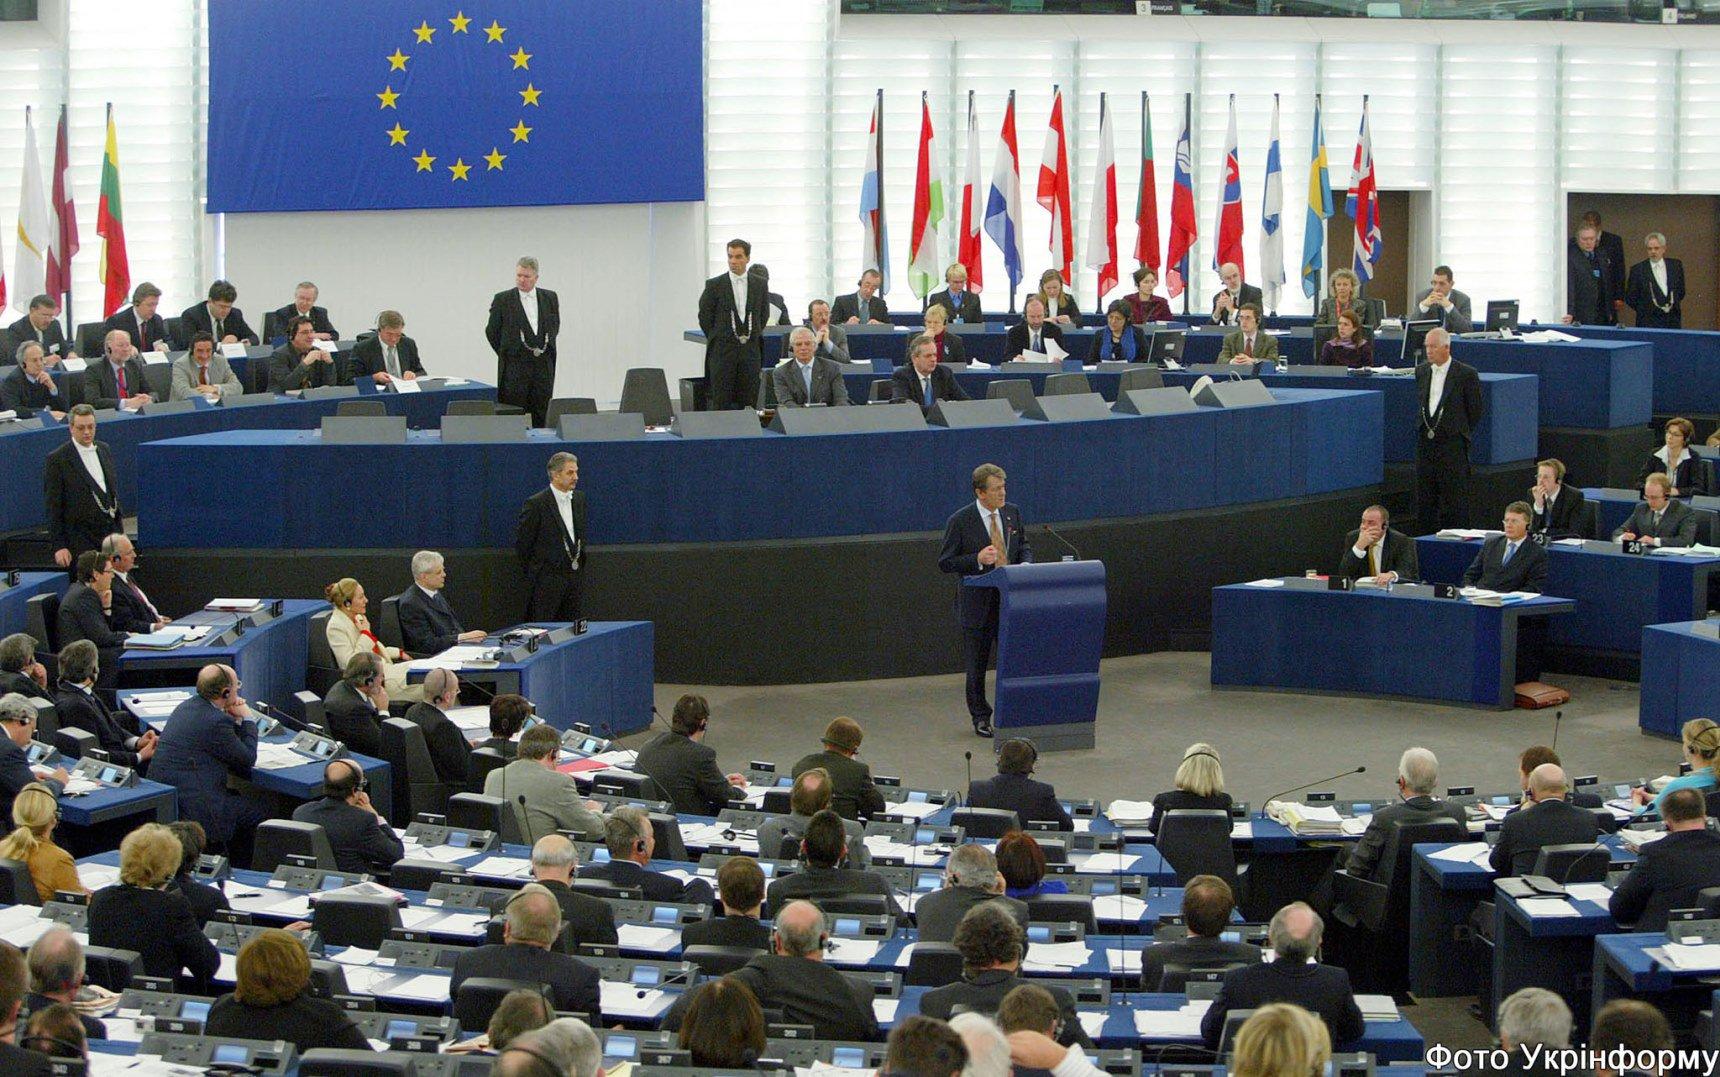 EU renews rejection of Israeli sovereignty over 1967 territories